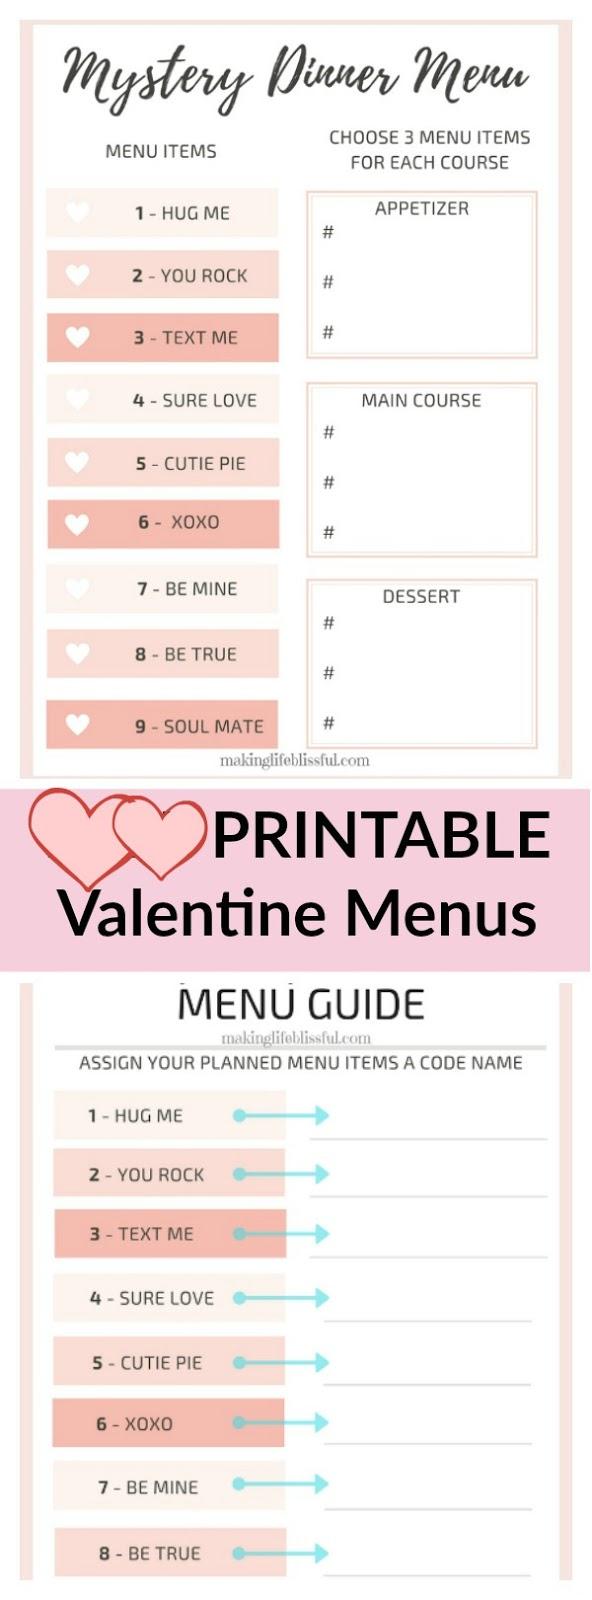 Printable Valentine Mystery Dinner Menus   Making Life Blissful